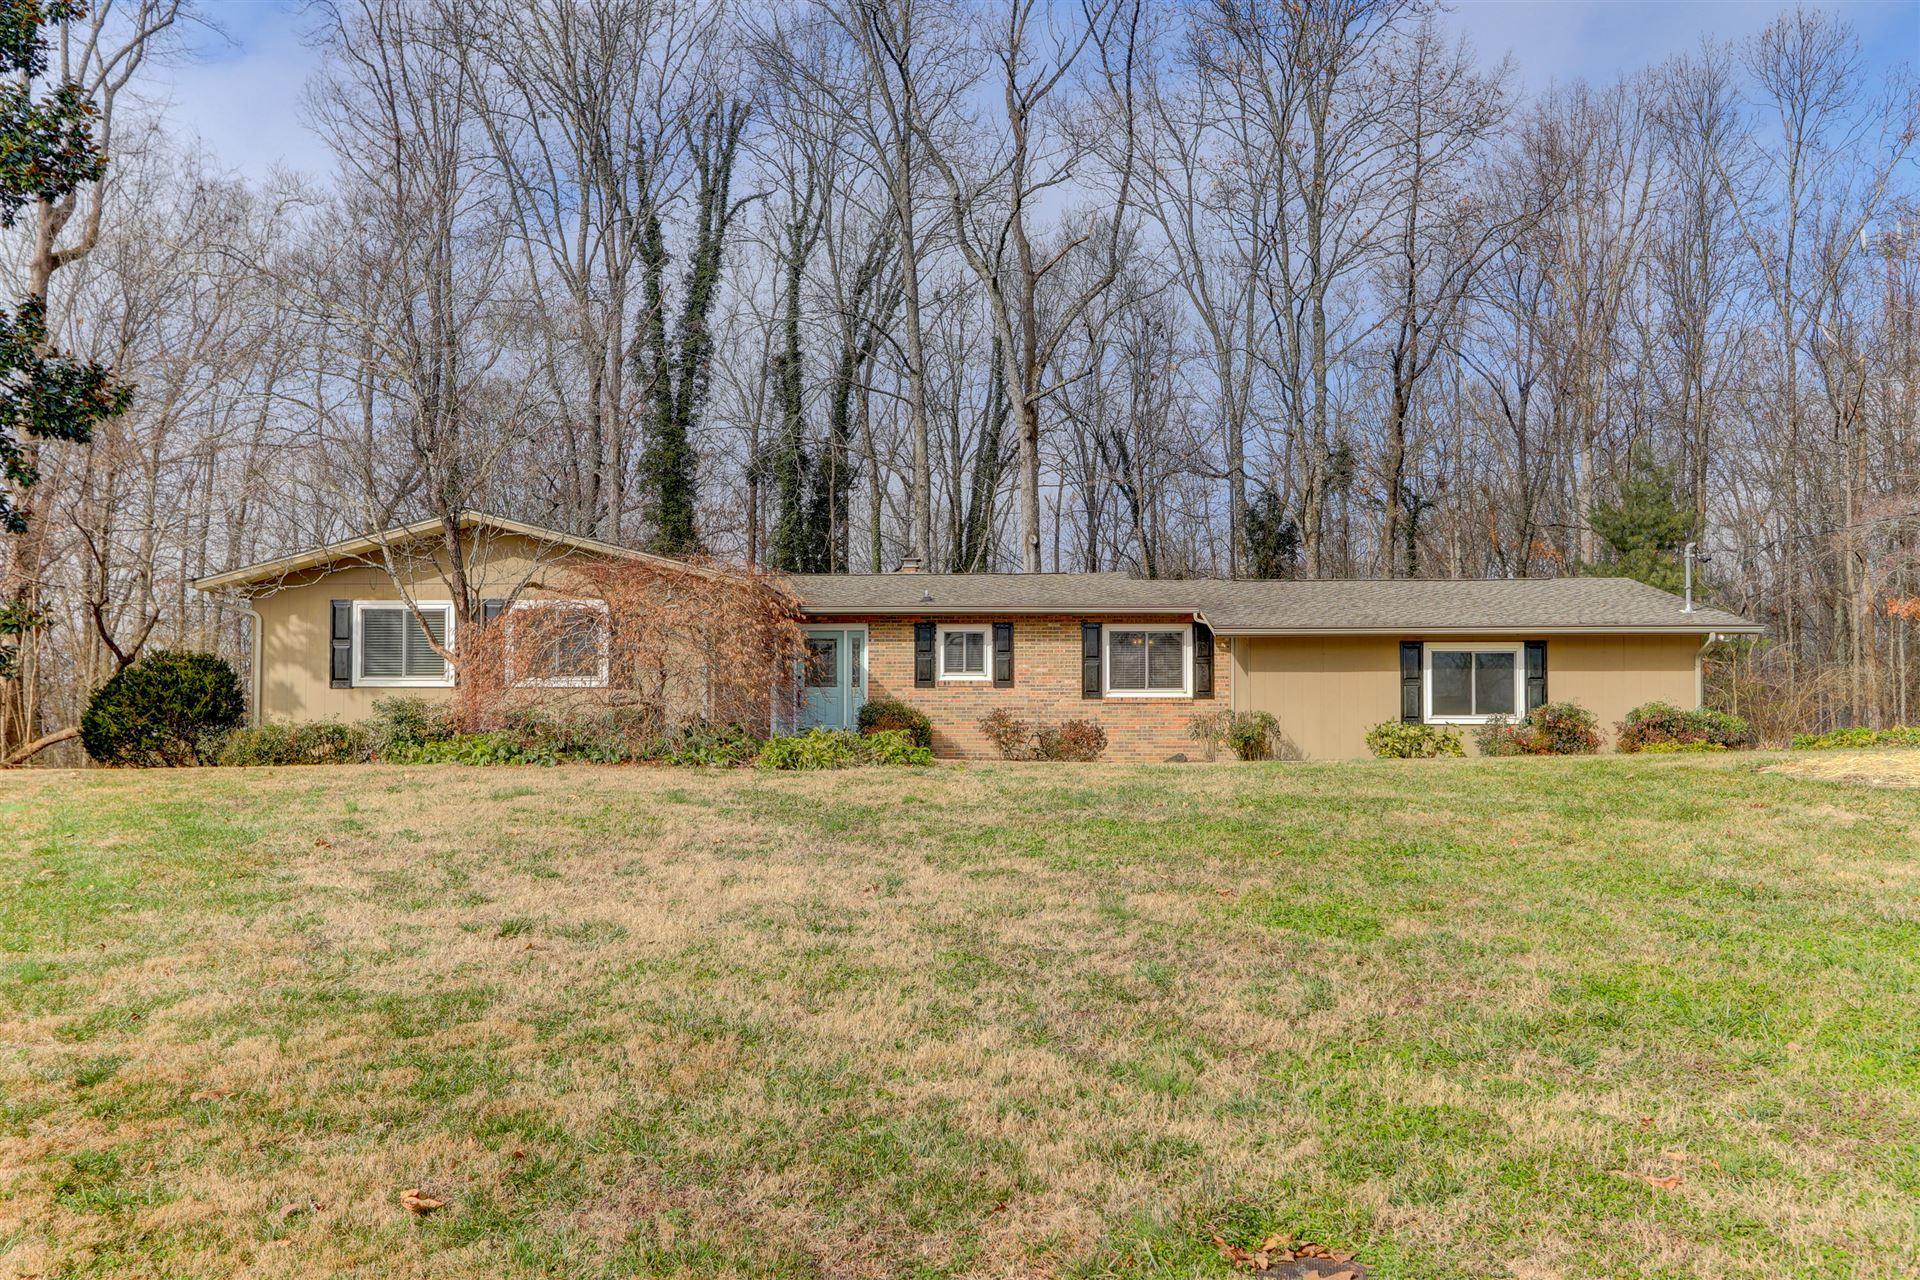 Photo of 7529 Glastonbury Rd, Knoxville, TN 37931 (MLS # 1140121)